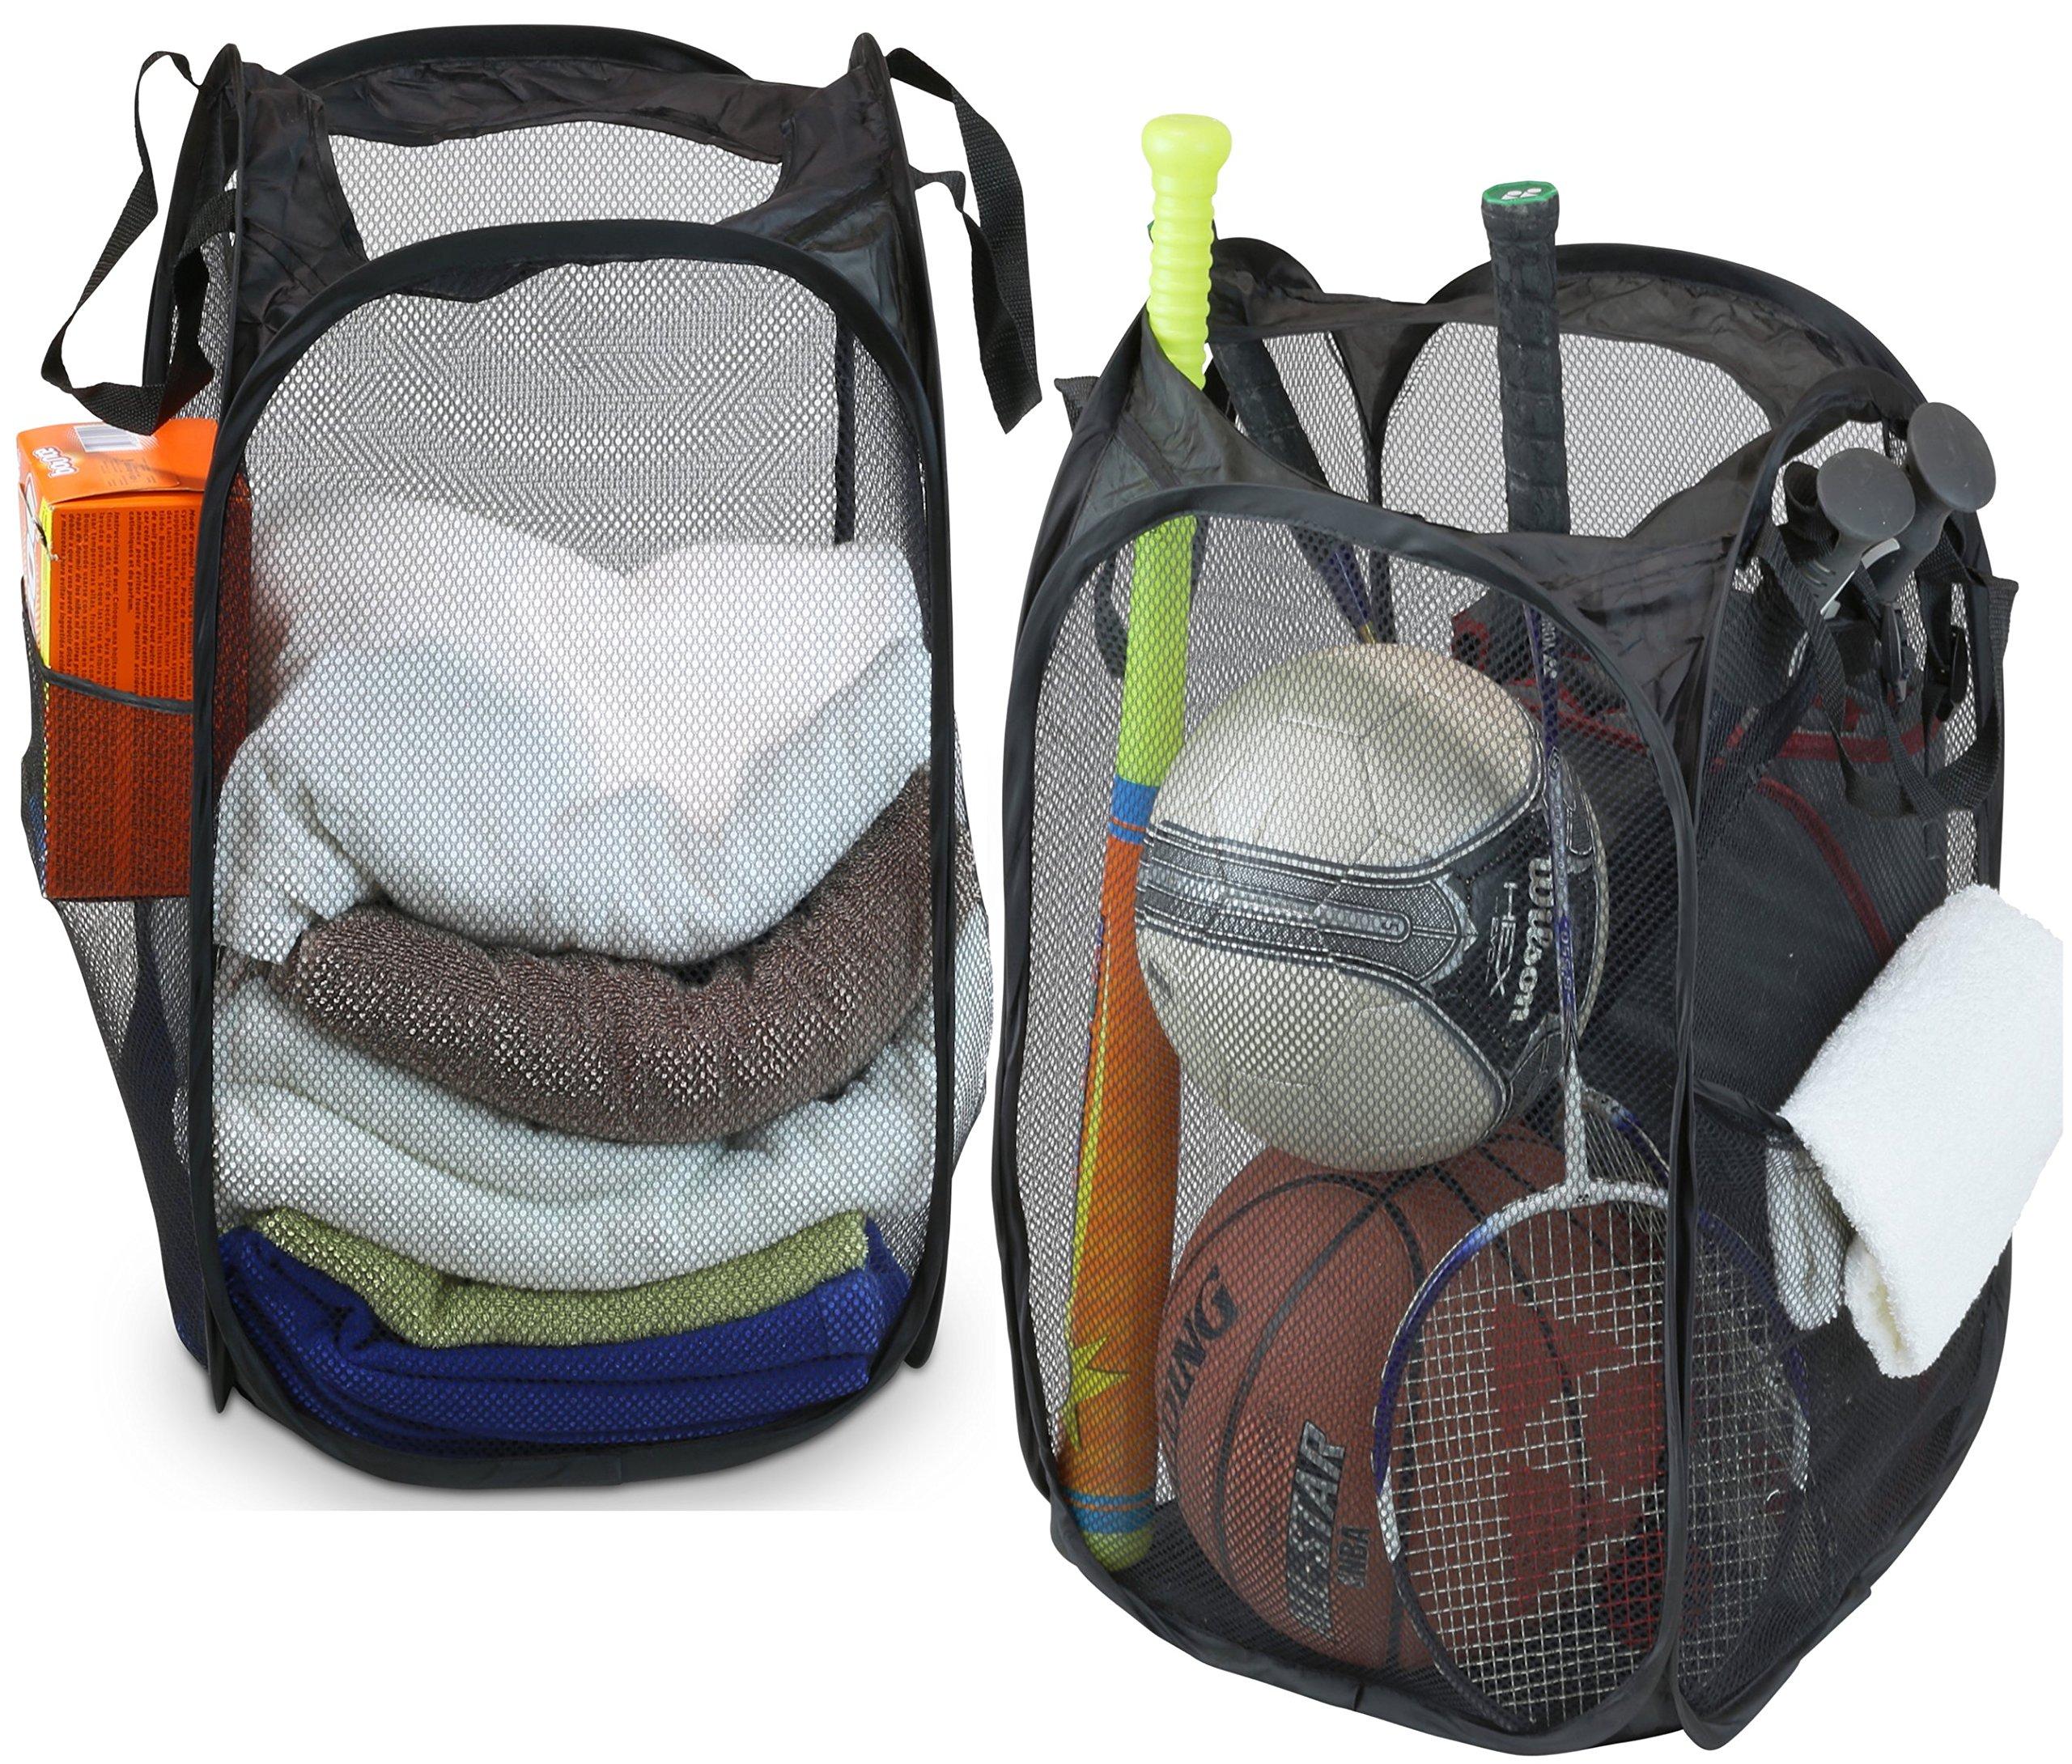 2 Pack Simplehouseware Mesh Pop Up Laundry Hamper Basket